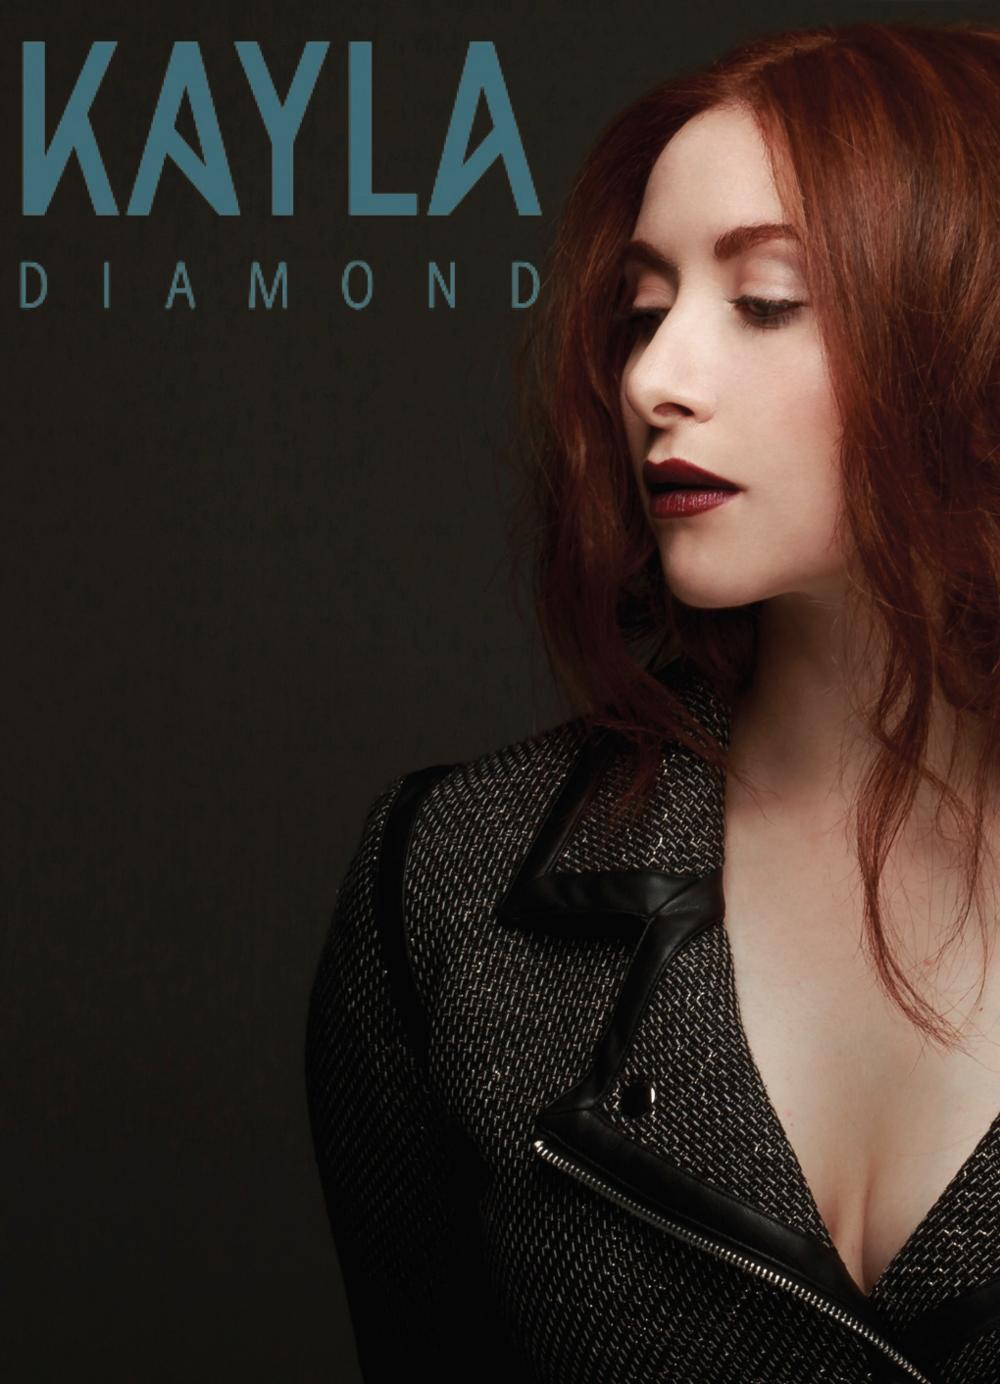 KAYLA DIAMONDw/ Aviva Cassie Dasilva - COVER: $10 ADV / $12 DOORMORE INFO